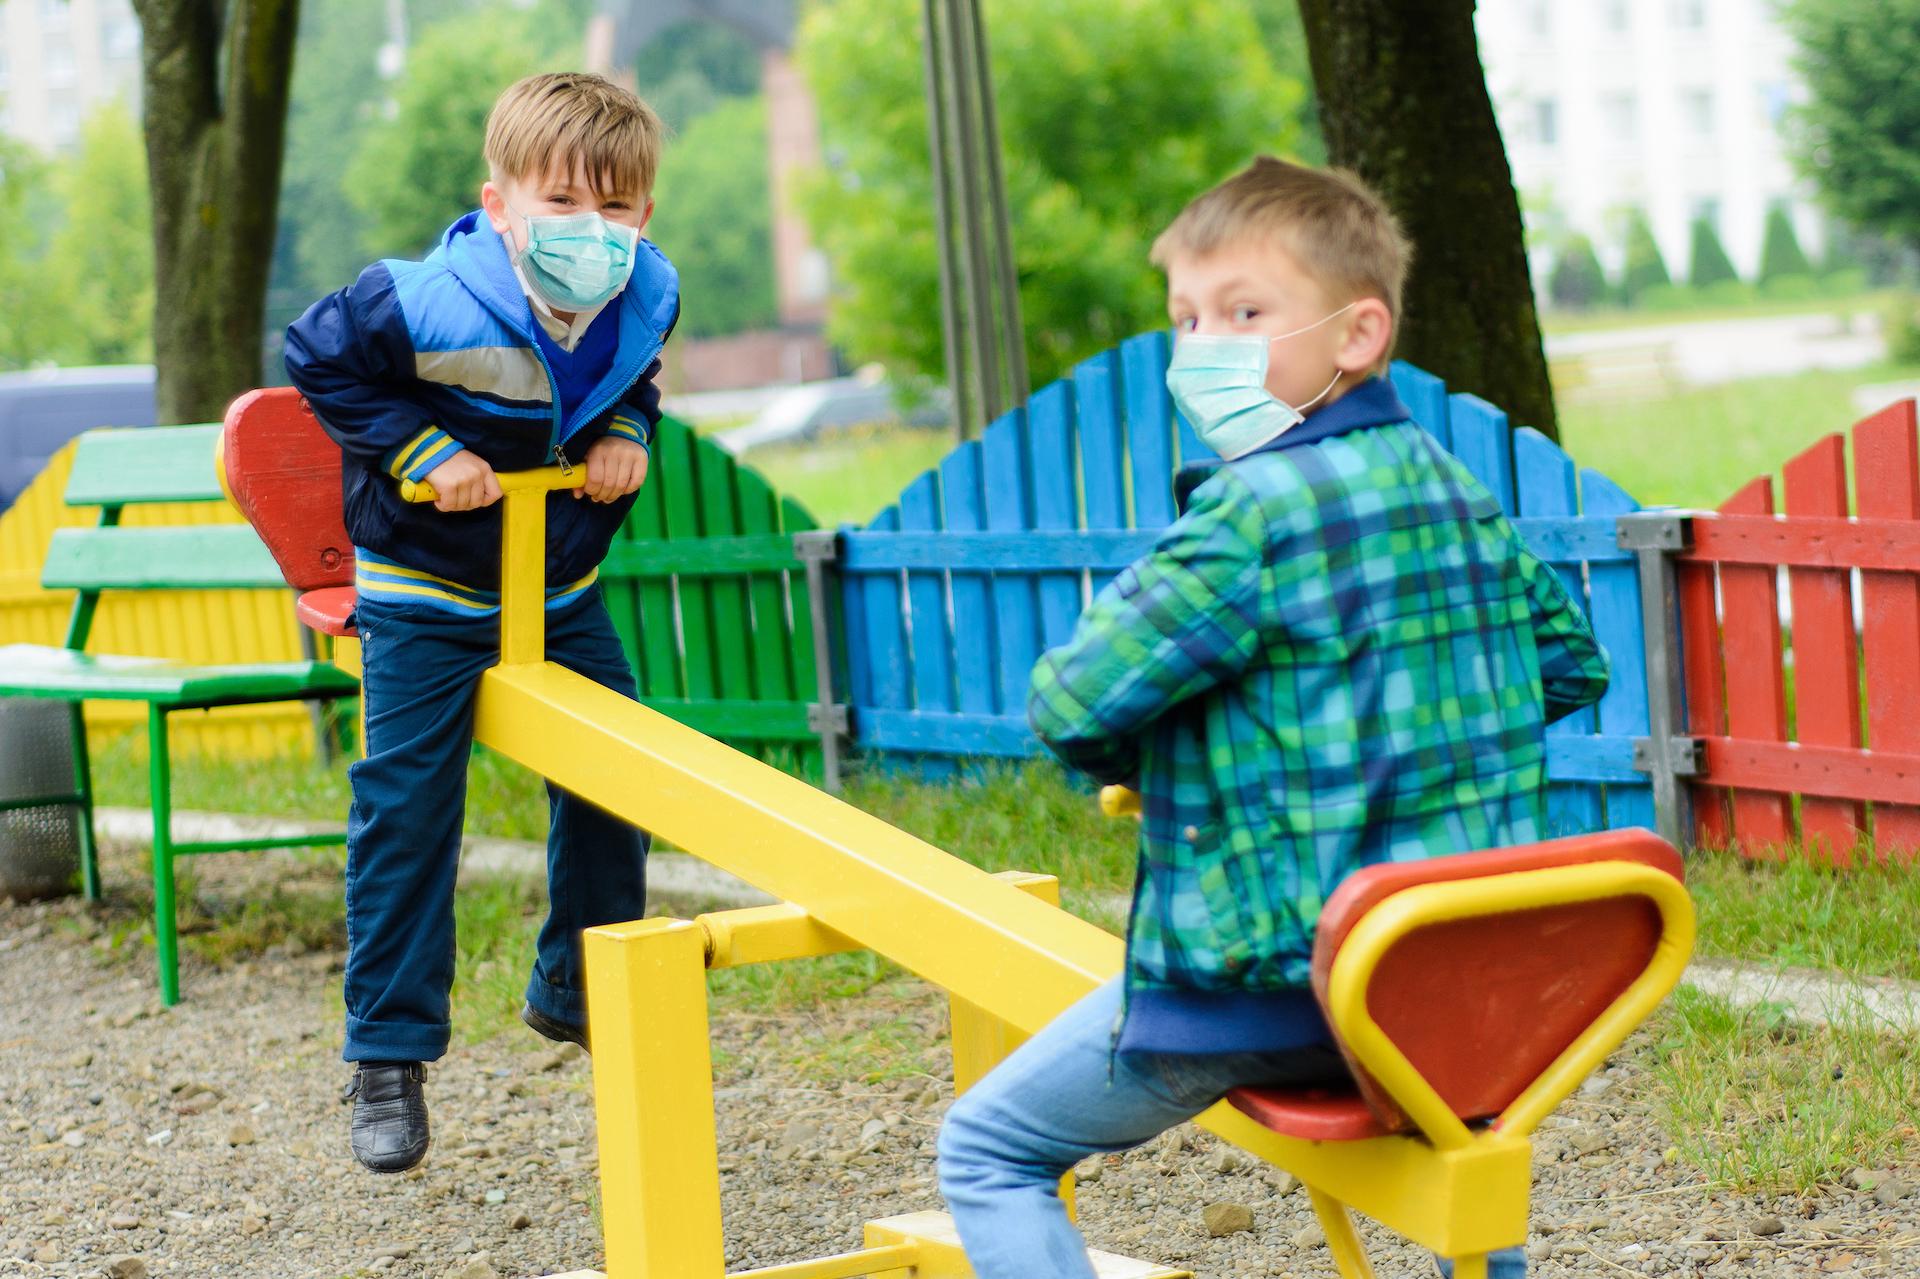 Children school in medical masks play at a quarantine playground